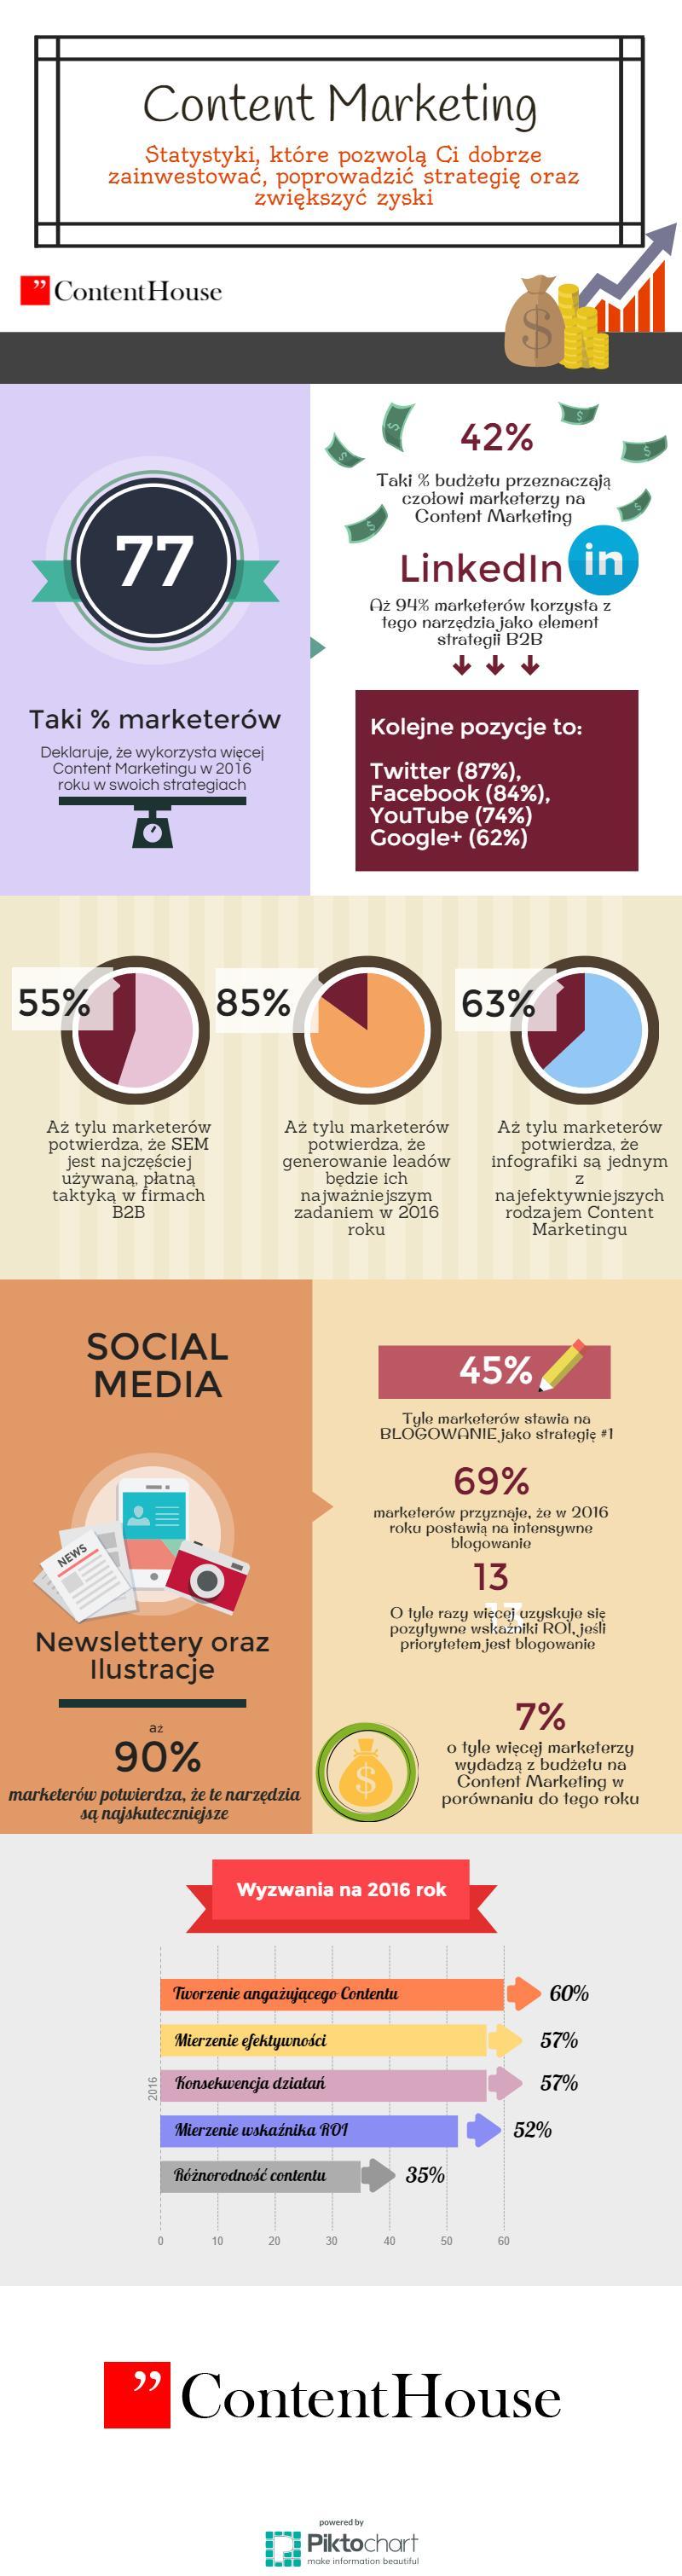 infografika content marketing